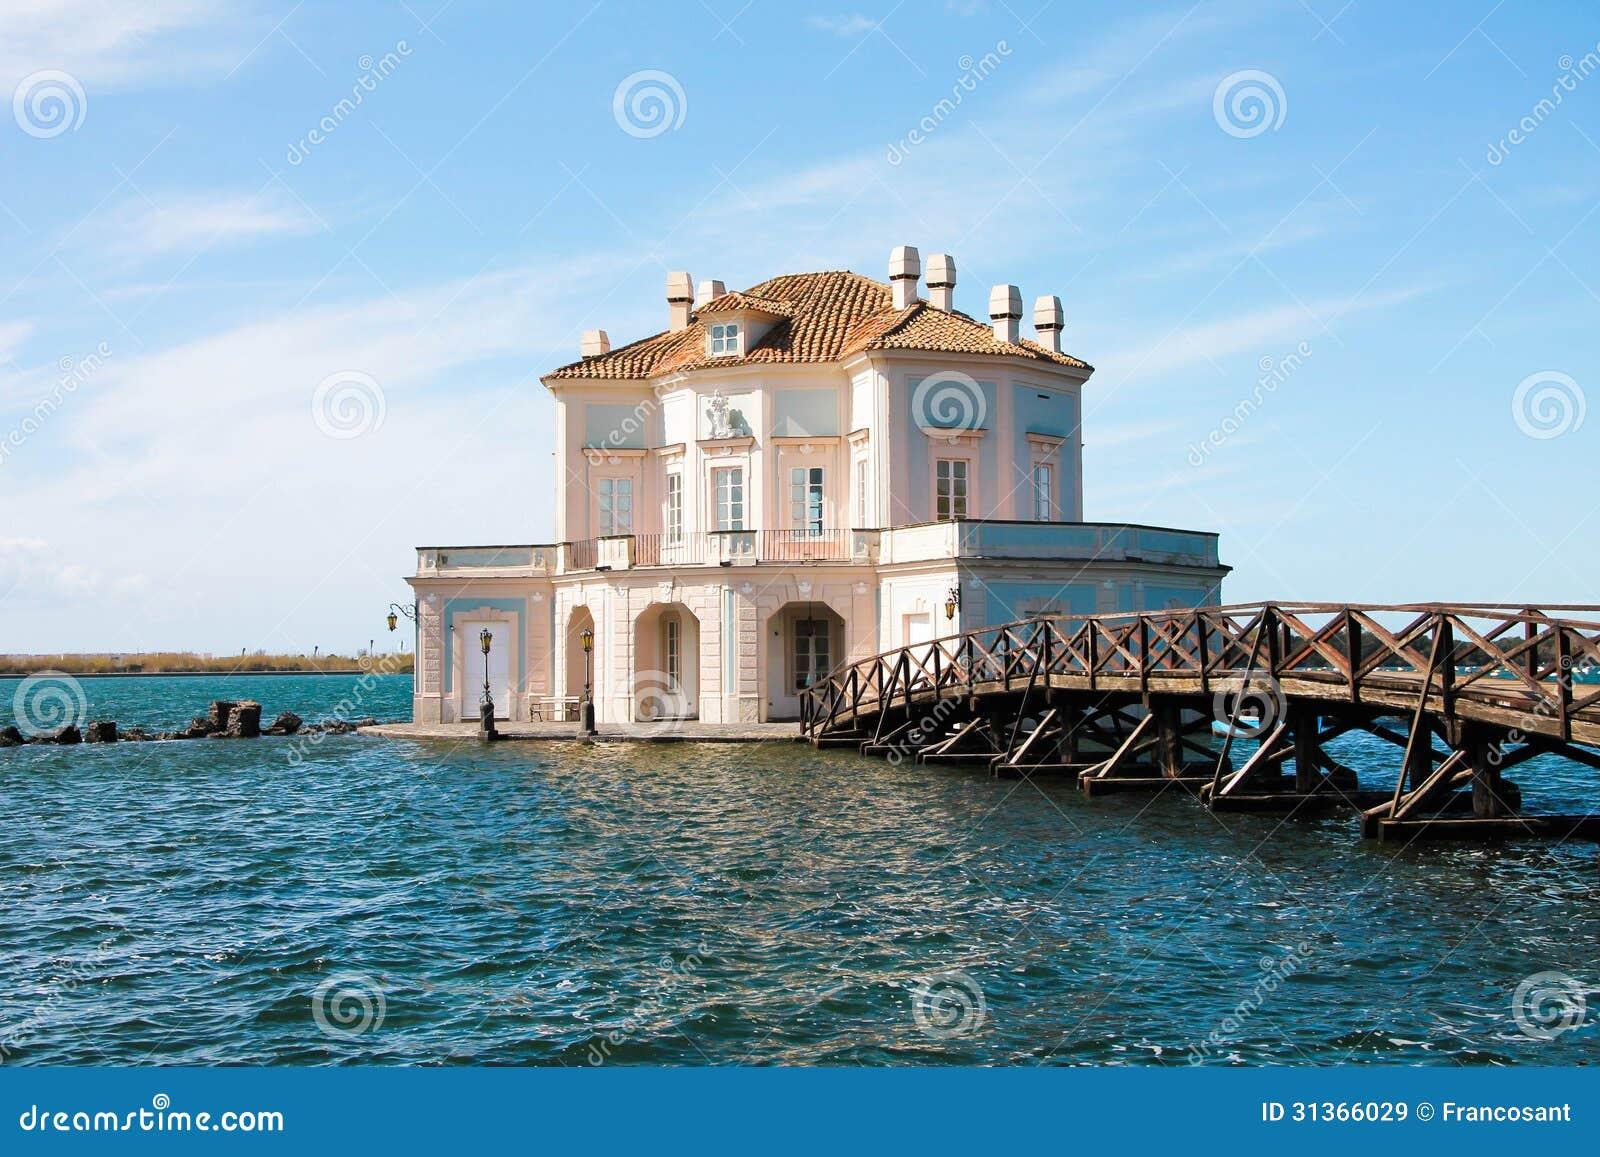 Italy - NAPOLI - Lago fusaro, Casina Vanvitelliana